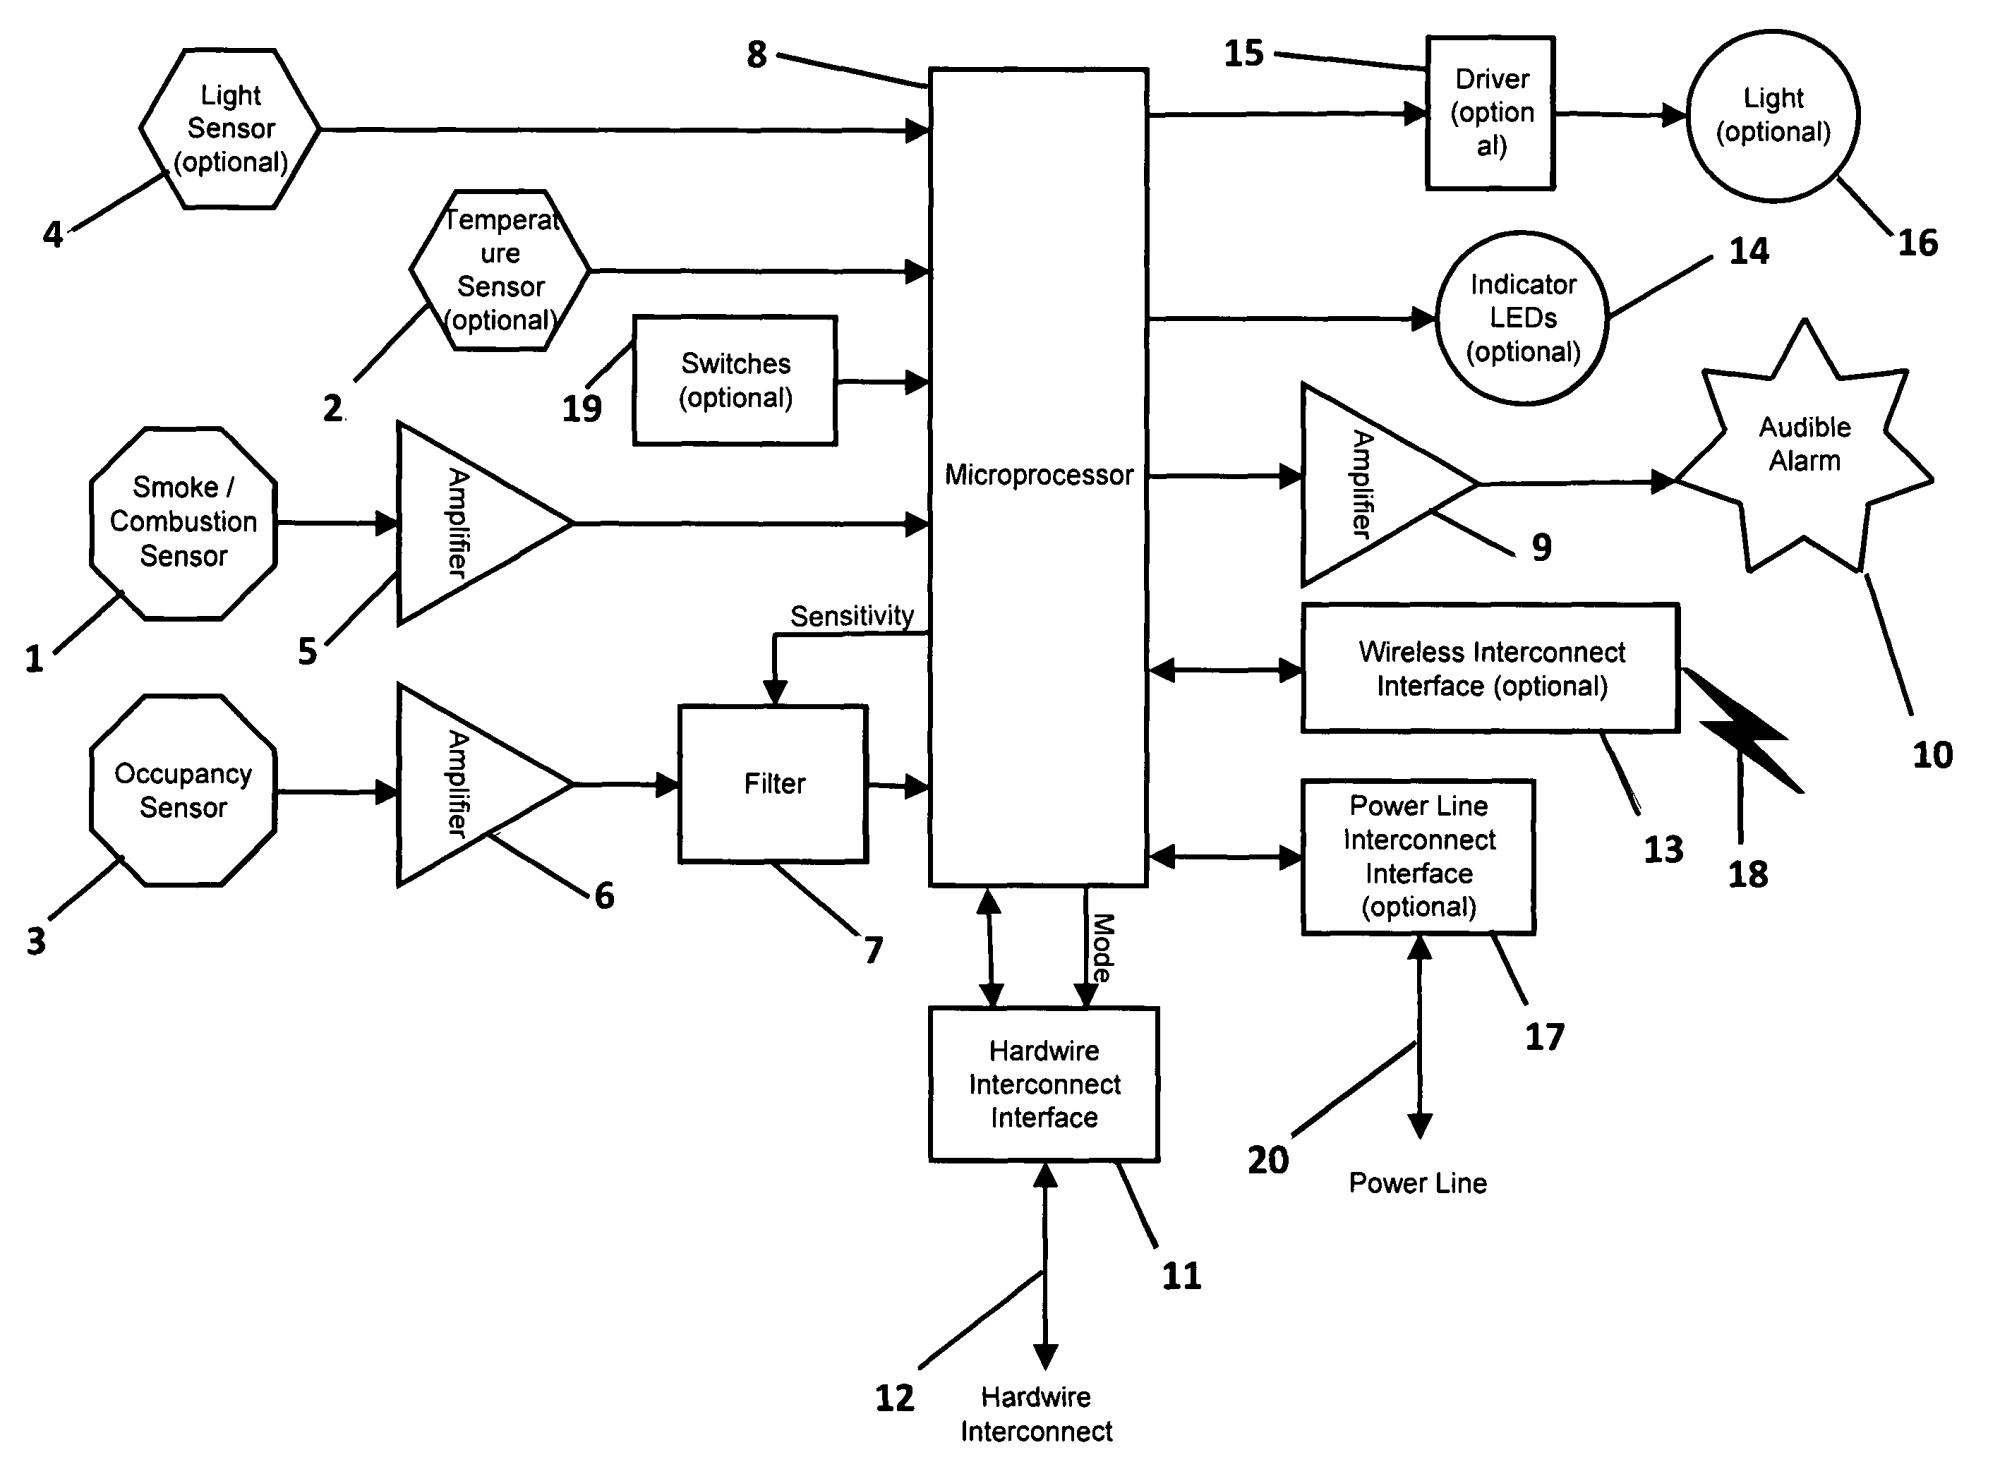 hight resolution of wiring multiple occupancy sensors imageresizertool com occupancy sensor wiring diagram occupancy sensor wiring diagram